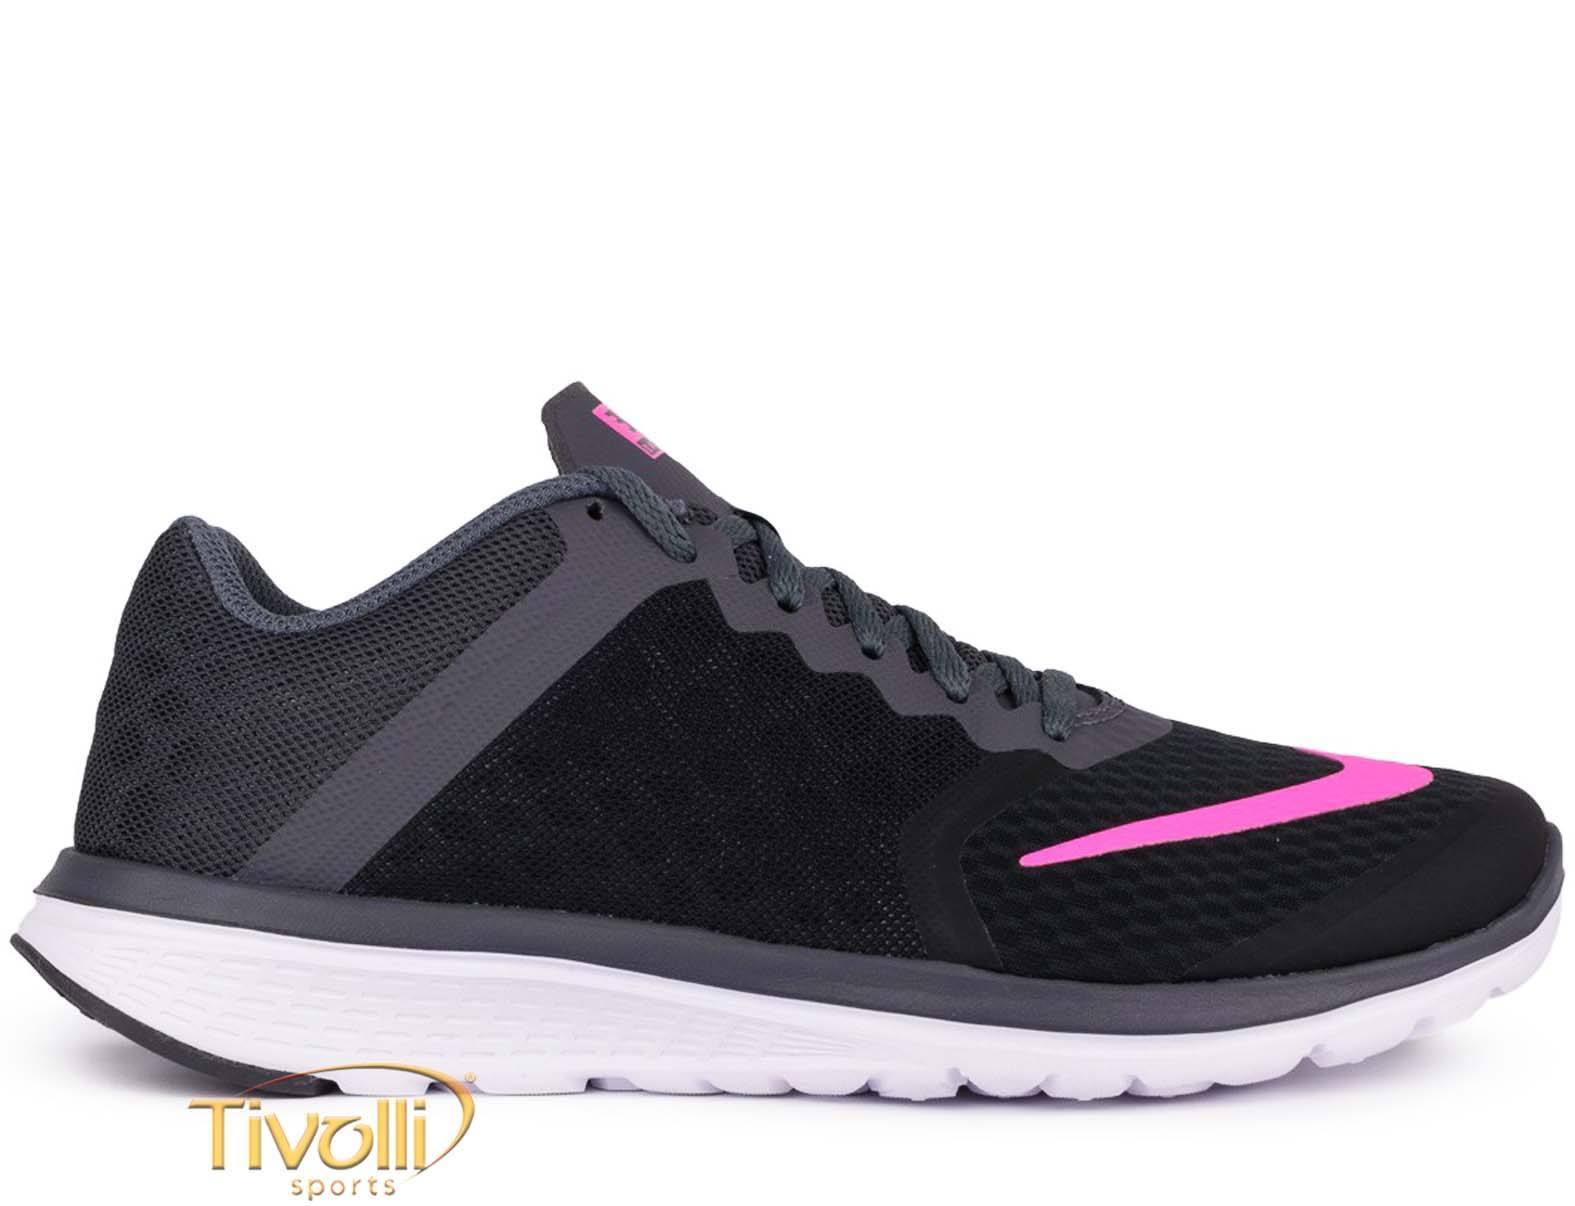 6858619f142 Raquete Mania   Tênis Nike FS Lite Run 3 Feminino   Preto